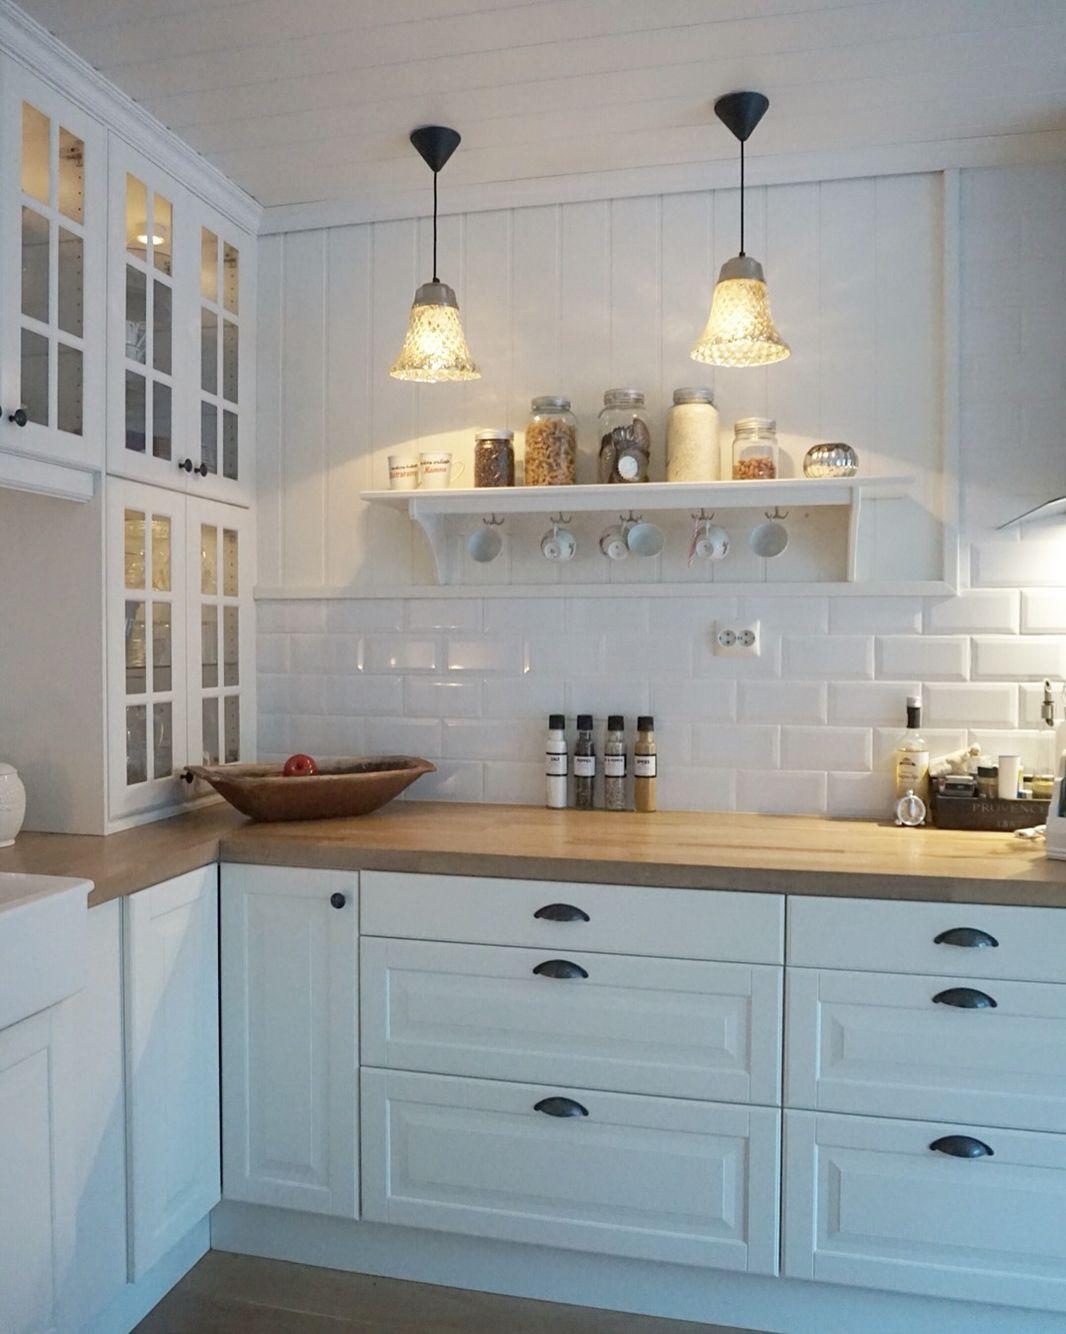 Detaljs by @behindabluedoor | Ikea küche landhaus, Küche ...